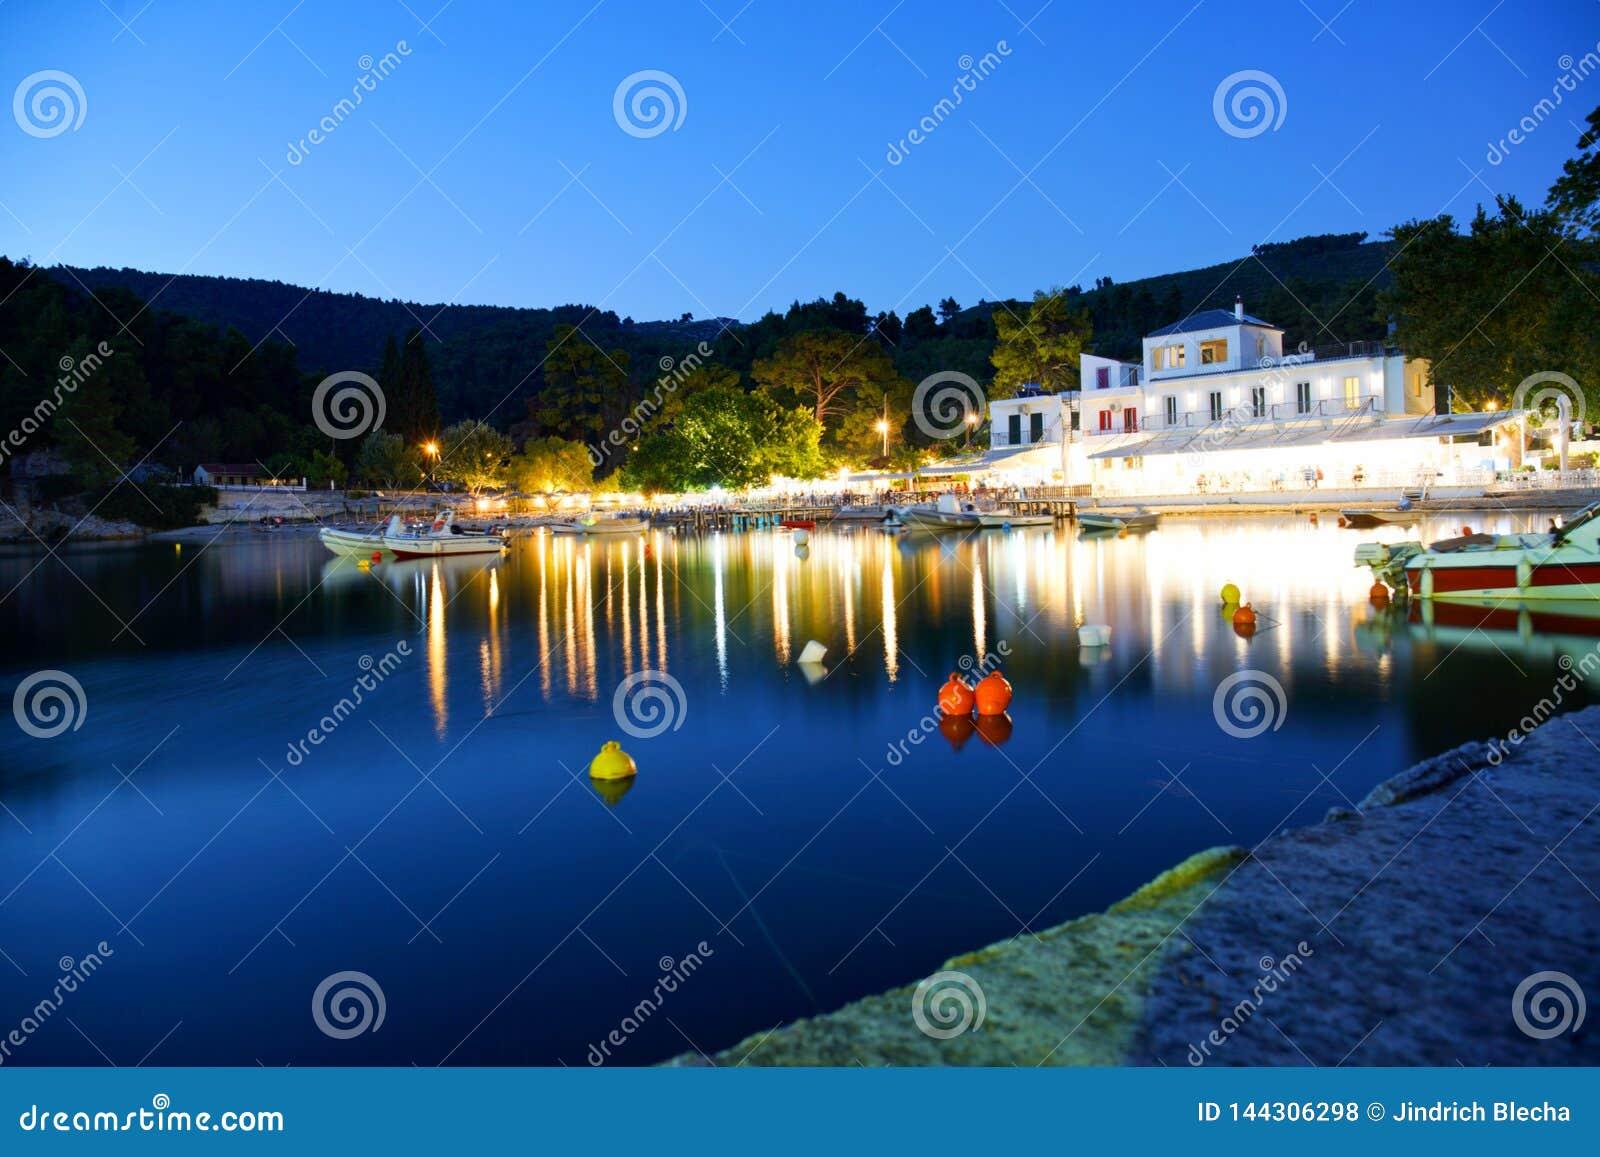 Agnontasstrand en baai bij zonsondergang, Skopelos, Griekenland